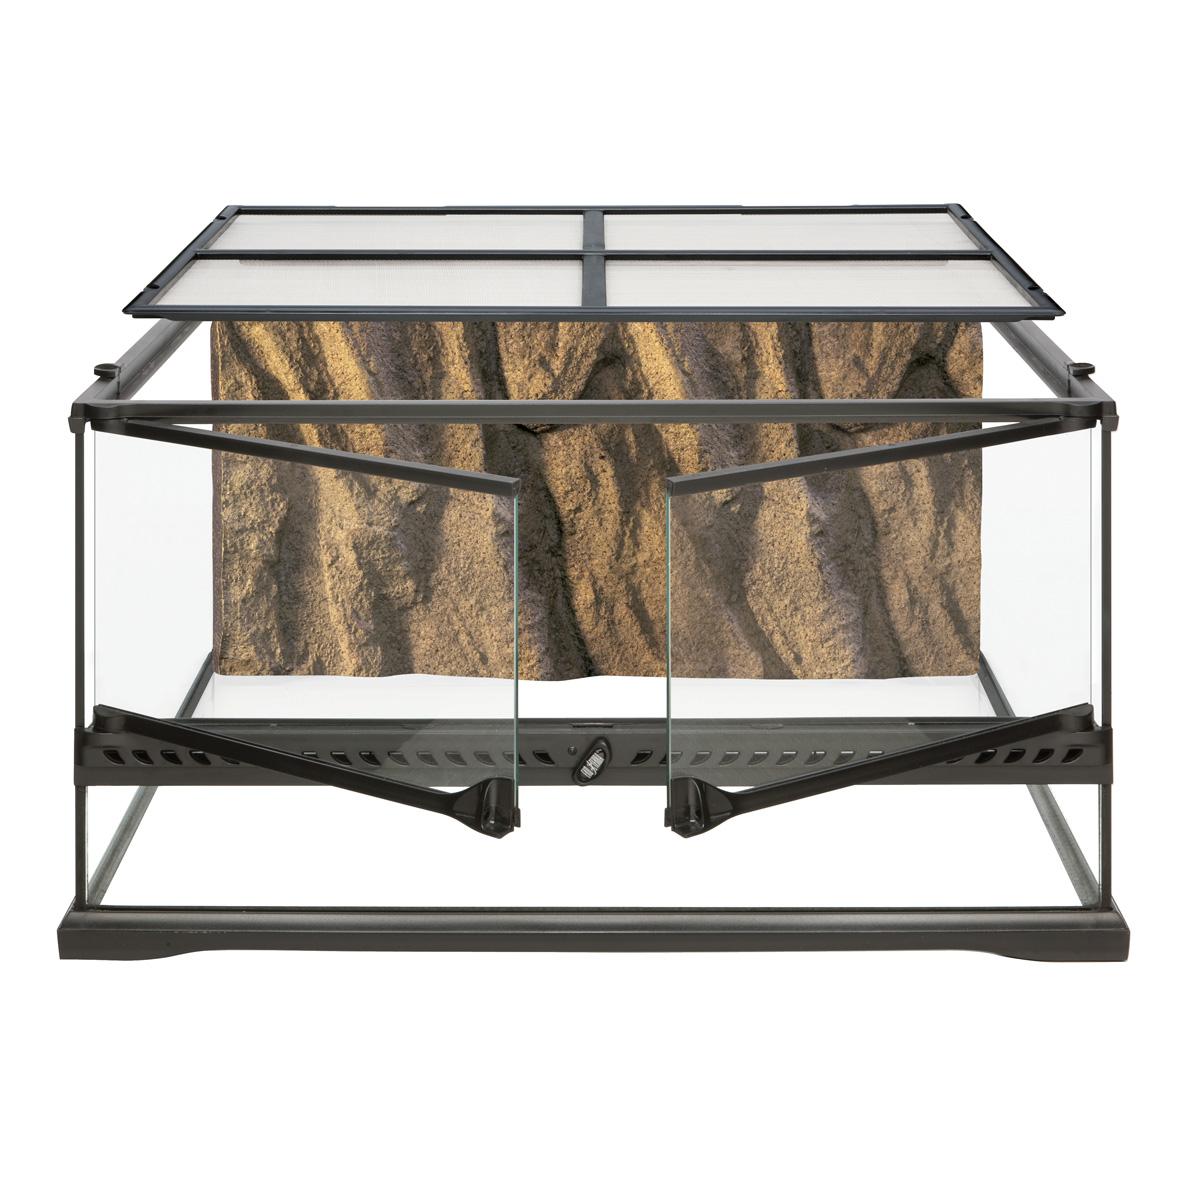 exo terra natural terrarium low g nstig kaufen bei zooroyal. Black Bedroom Furniture Sets. Home Design Ideas